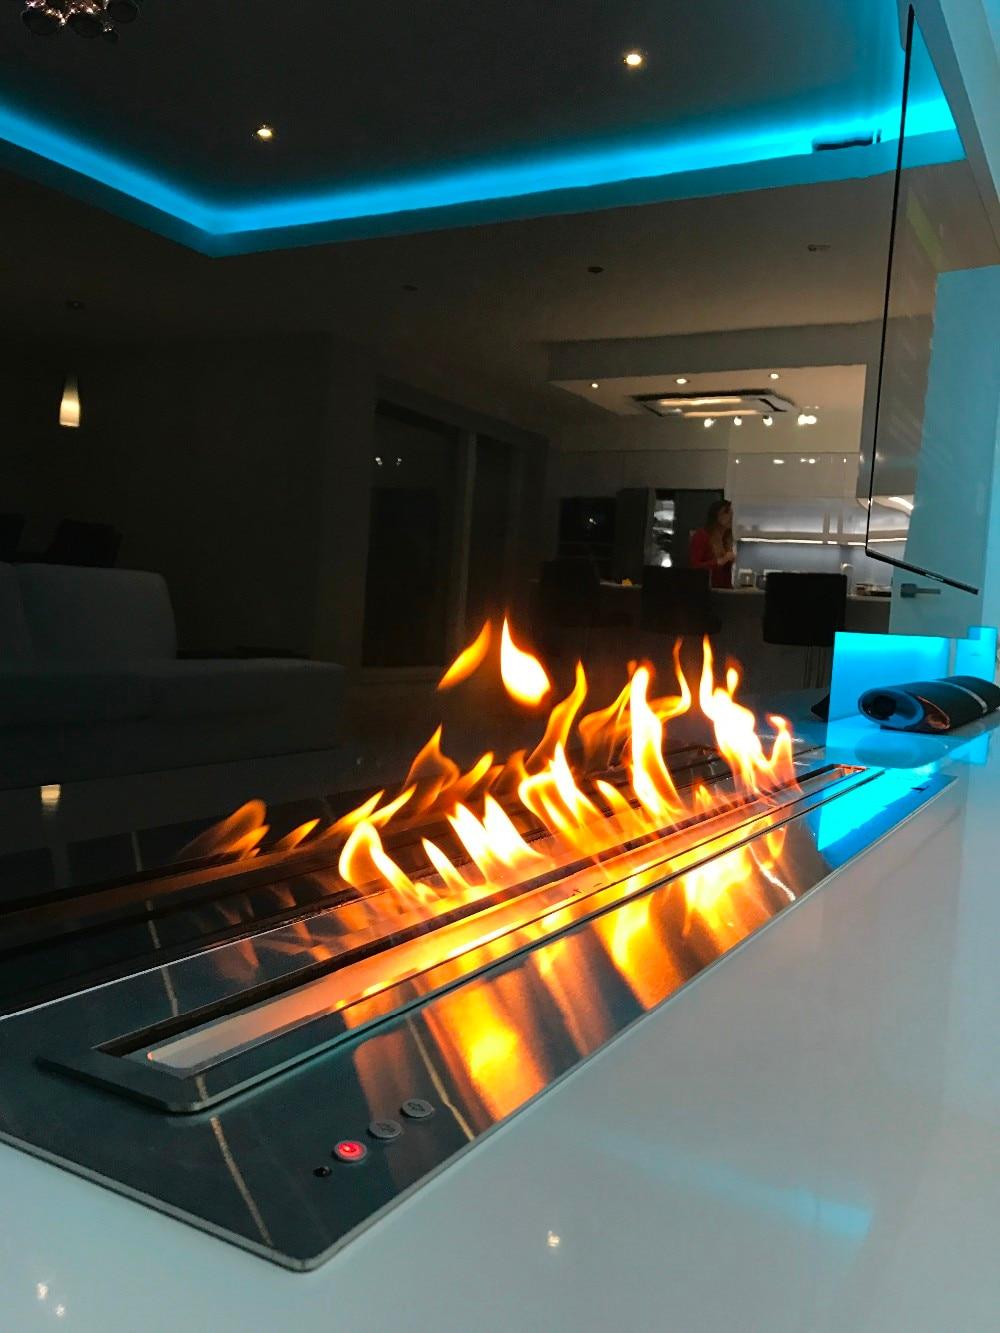 48 Inch Remote Control Intelligent Bio Ethanol Black Electric Fireplace